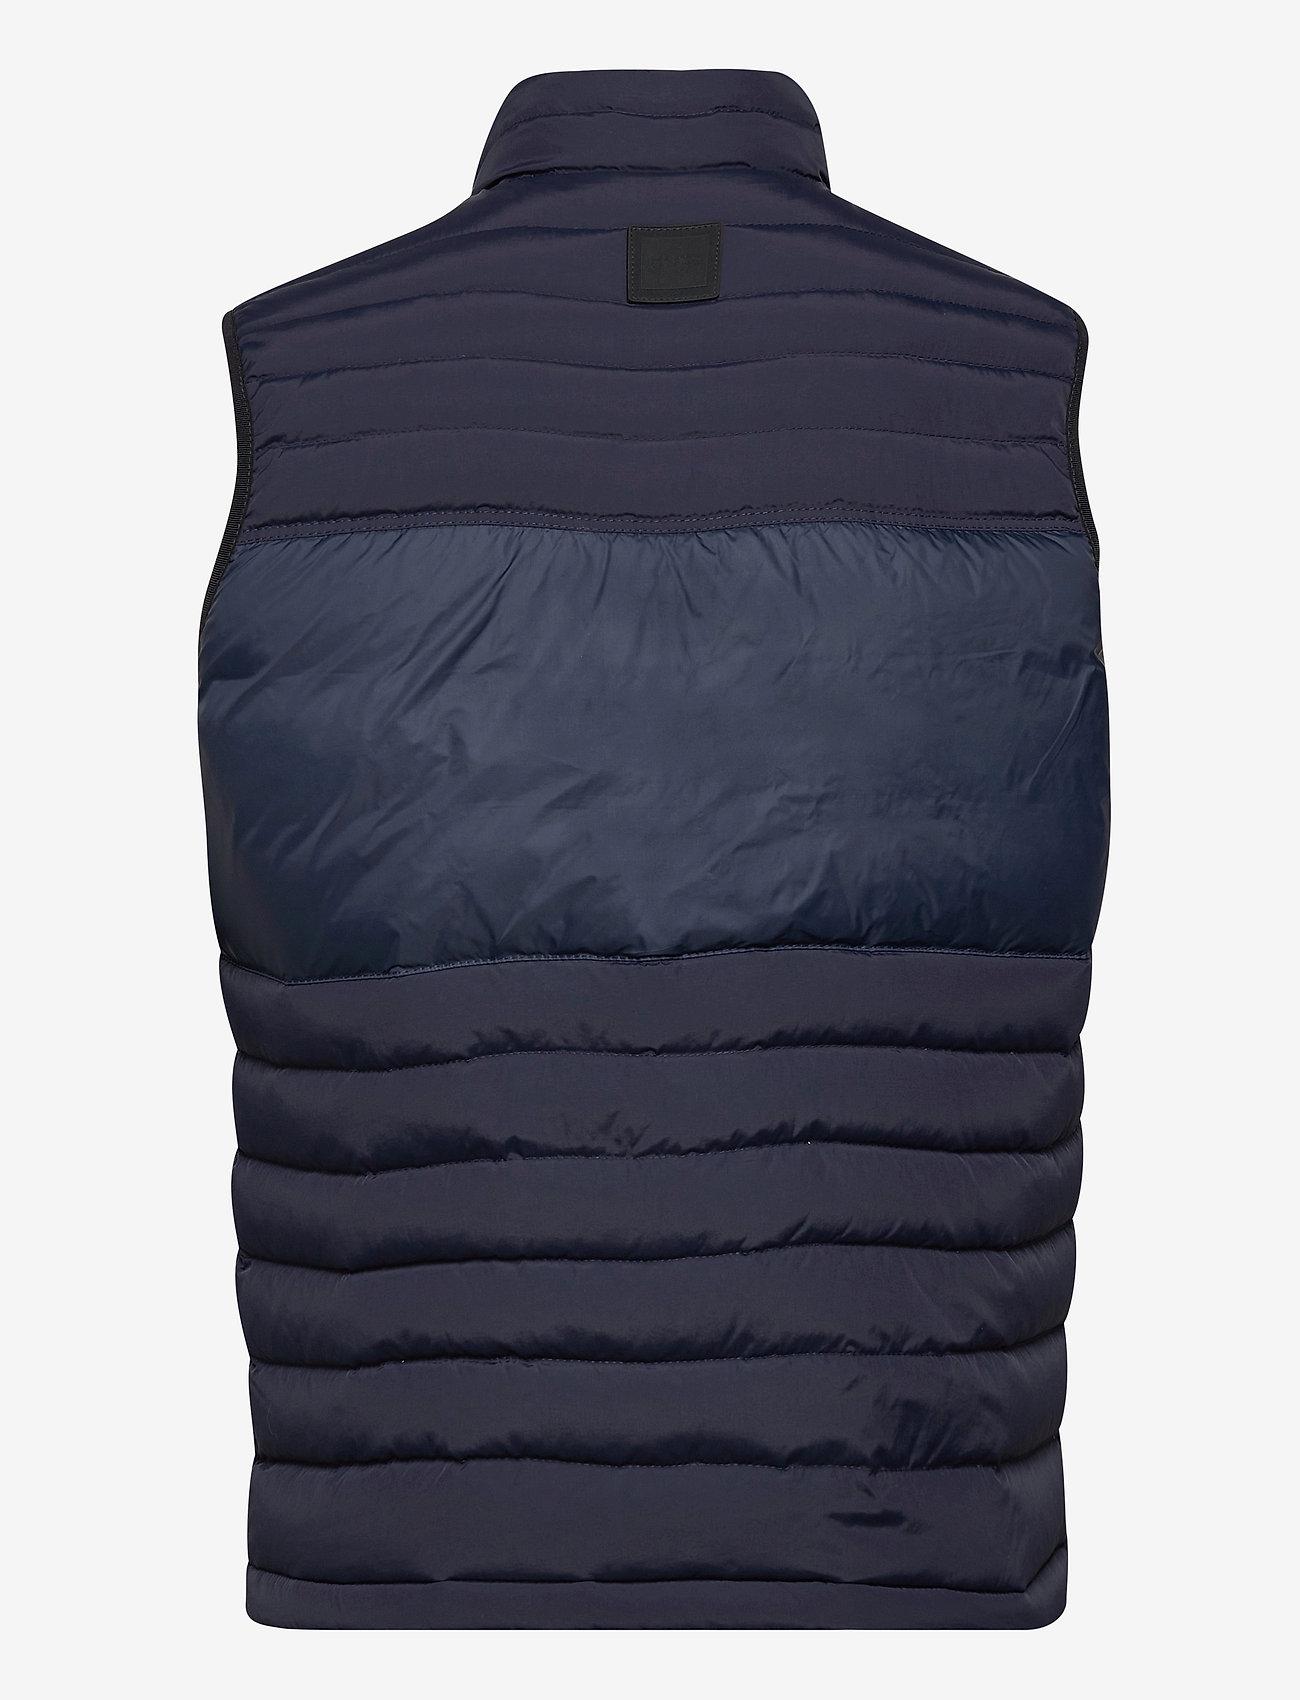 BOSS - Olmarv - gilets sans manches - dark blue - 1